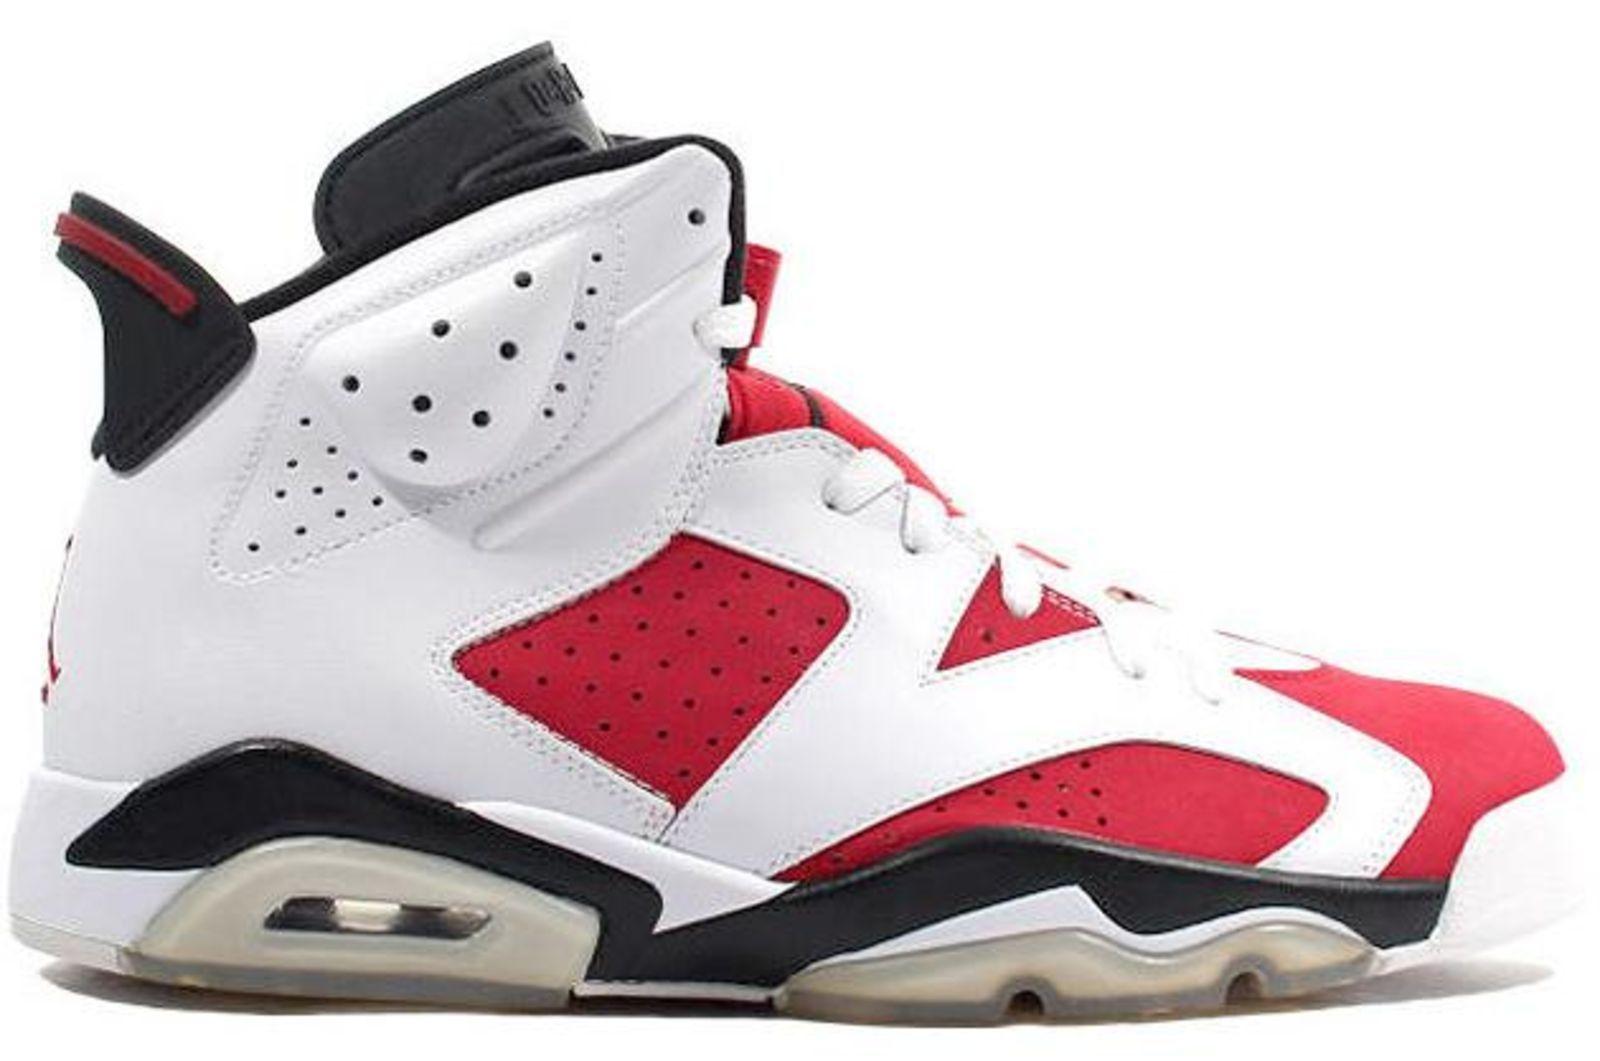 huge discount 2ff00 72b6f Discover ideas about Jordans 2014. Air Jordan 6 ...